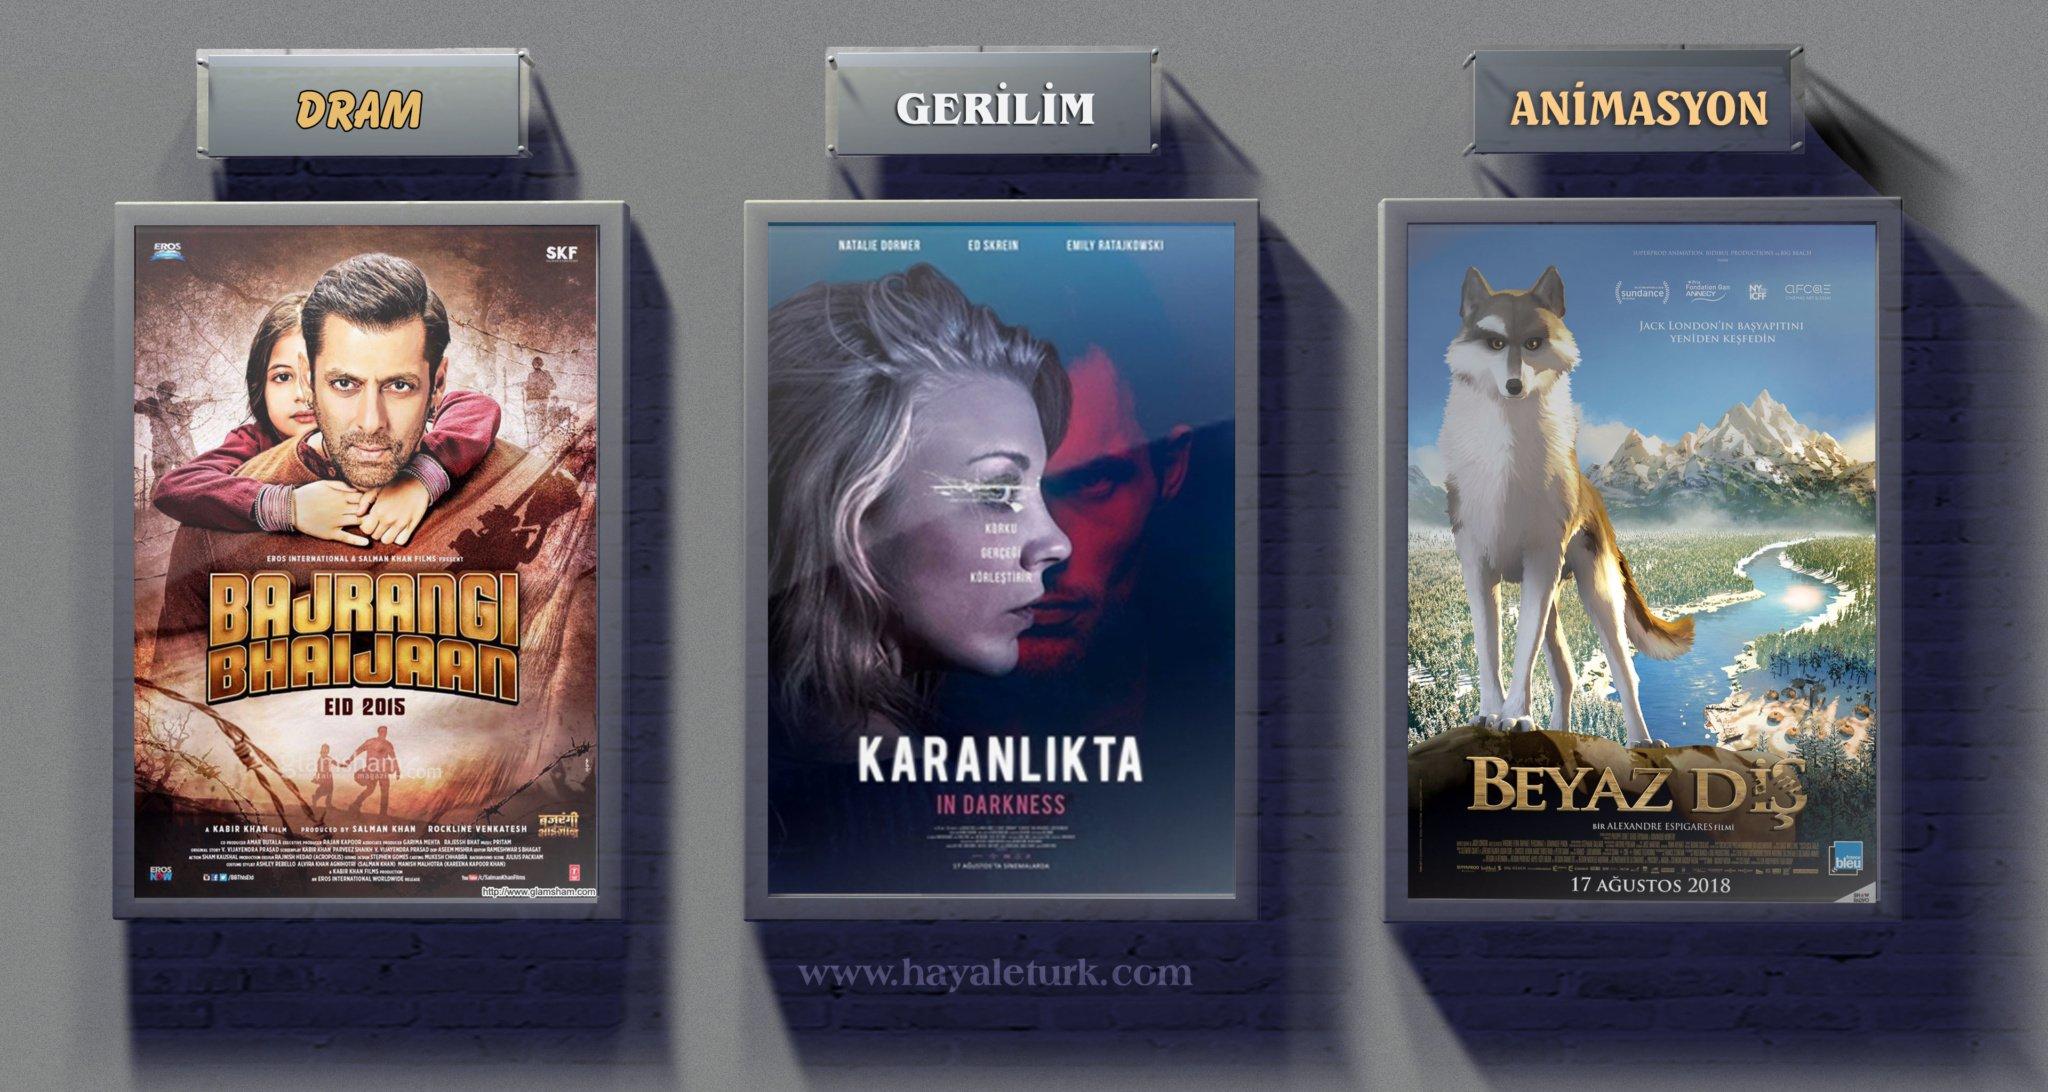 Sinemalarda bu hafta 9 Film vizyonda 17 - 24 Ağustos 2018